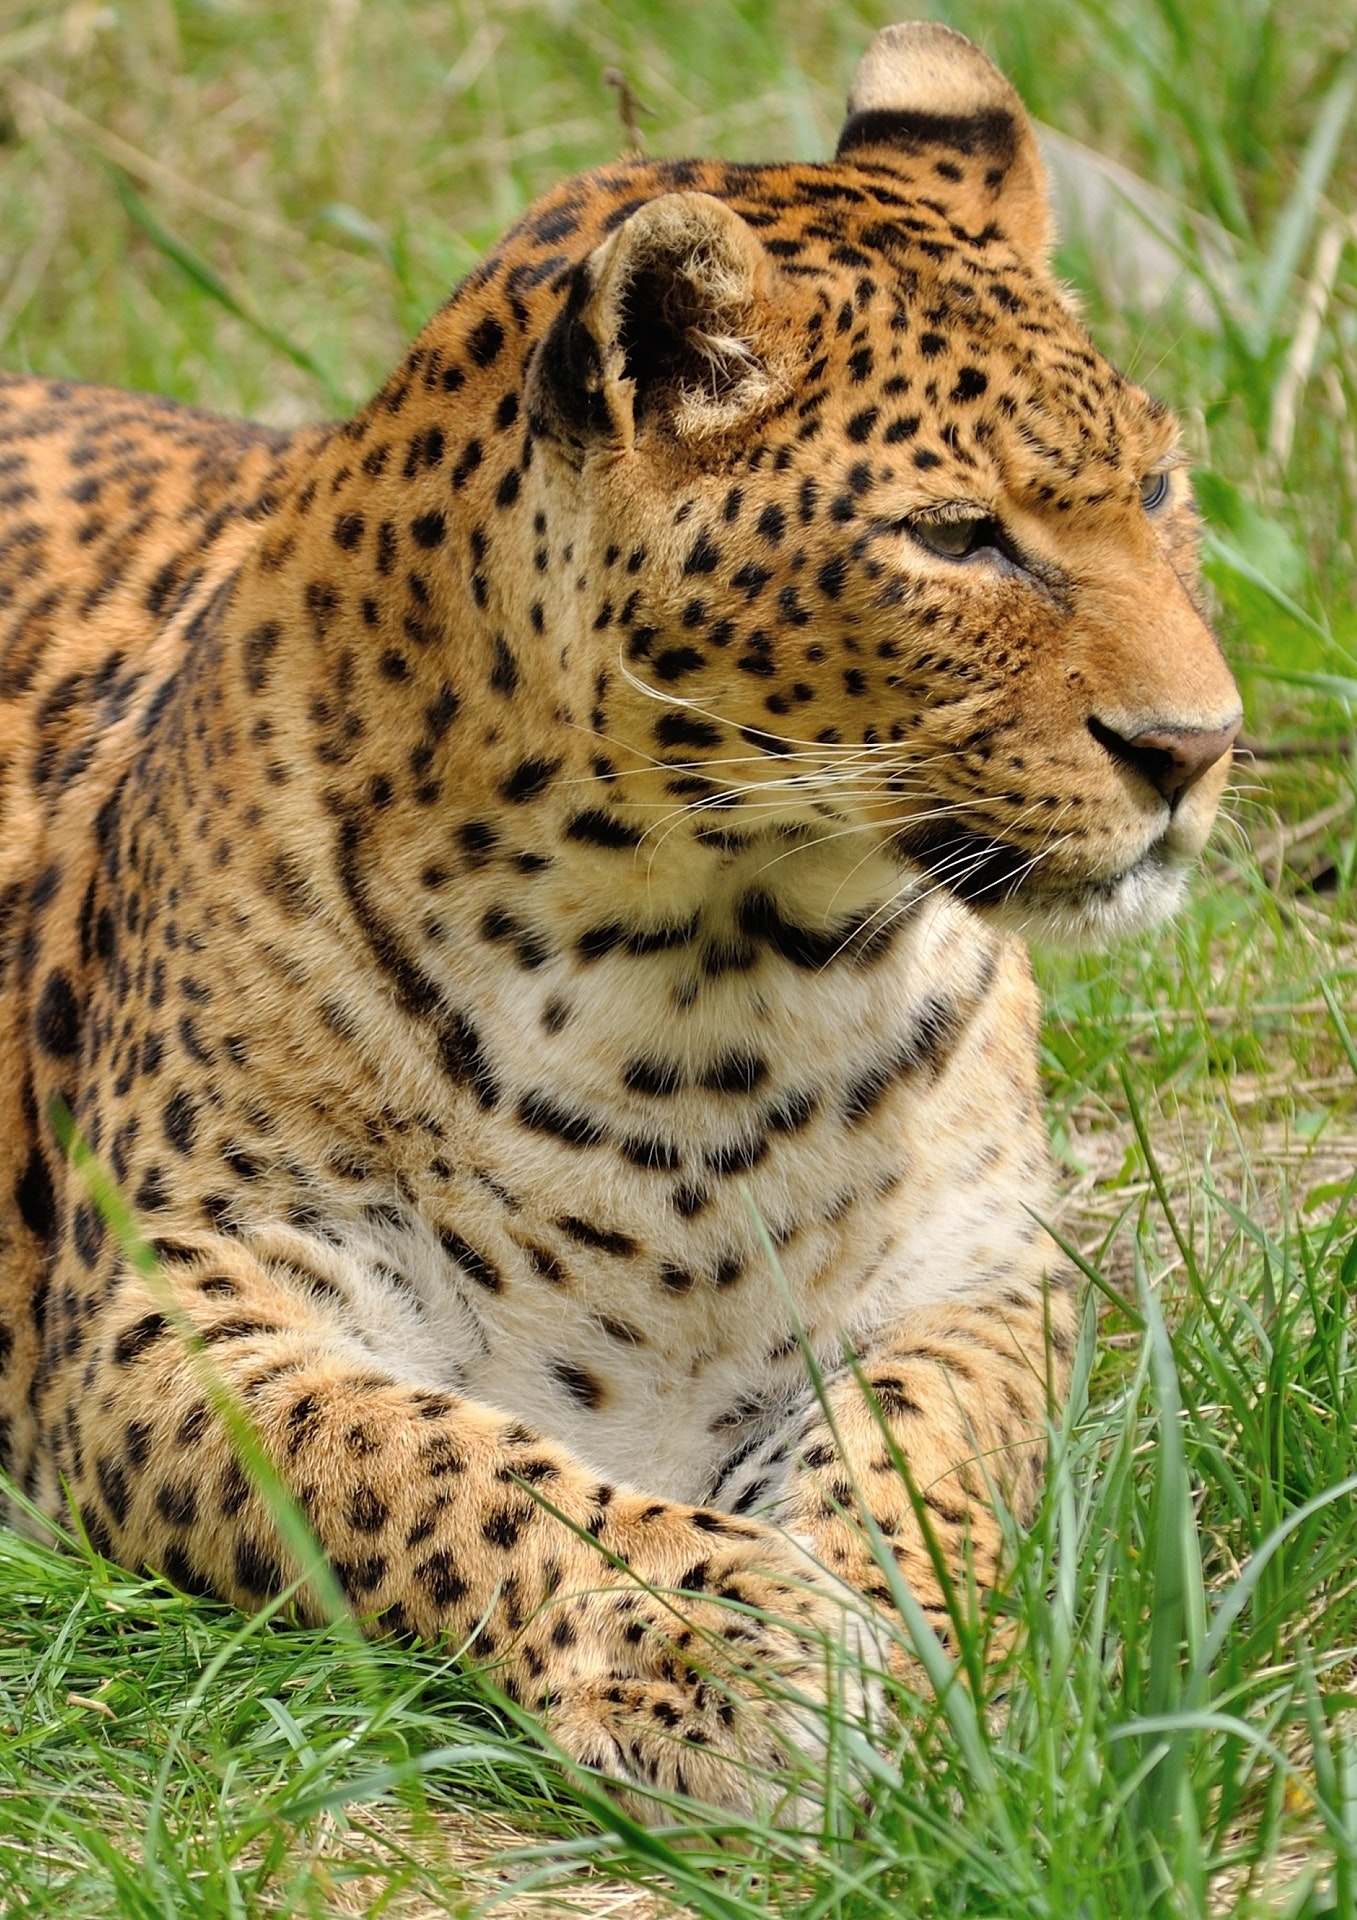 Cheetah In Green Grass Lawn 183 Free Stock Photo